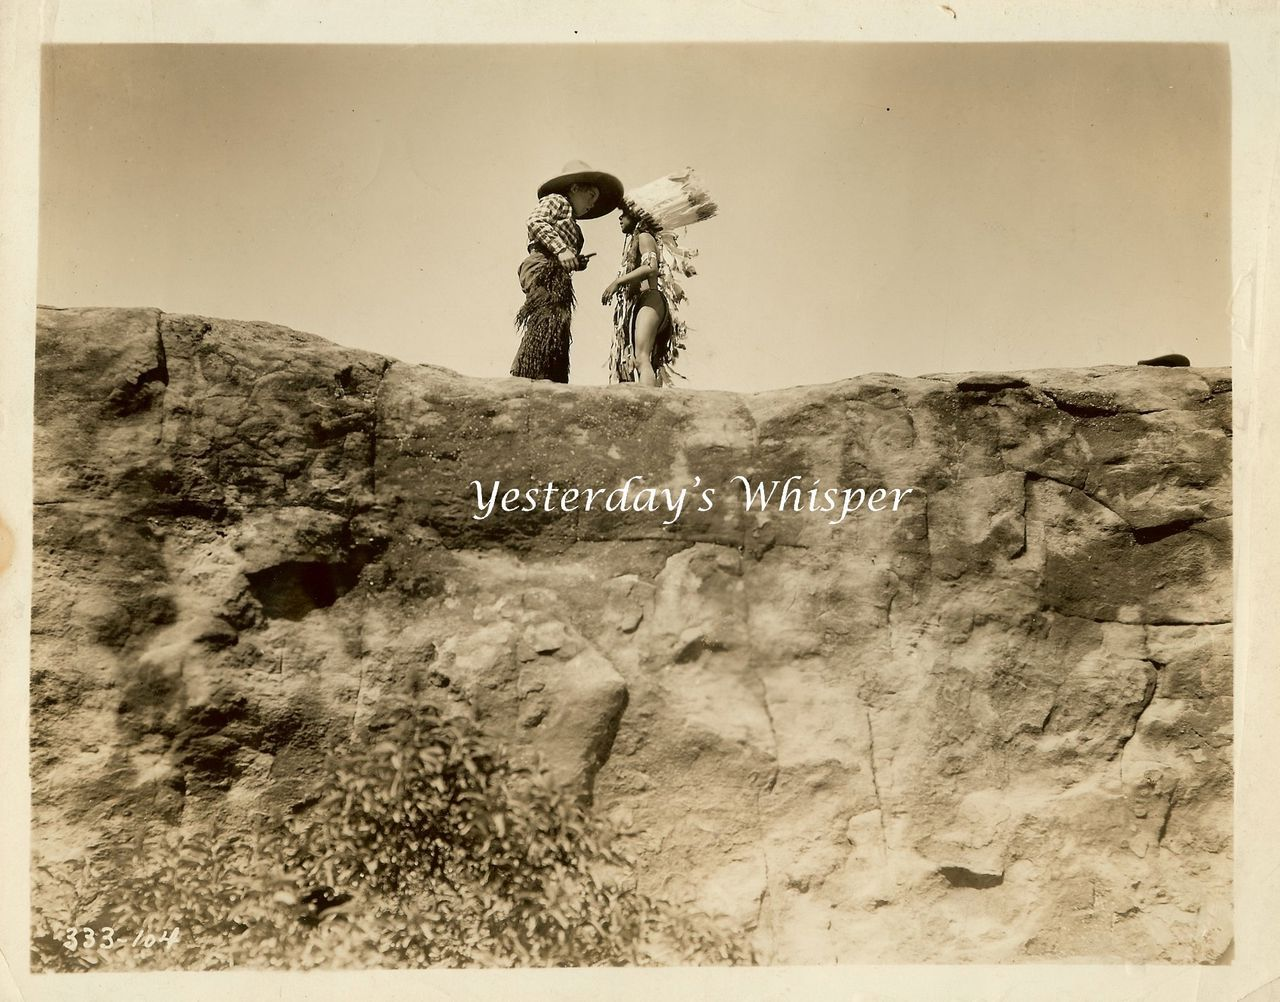 Wyoming 1928 Silent Era Western Original 8x10 B&W Photo